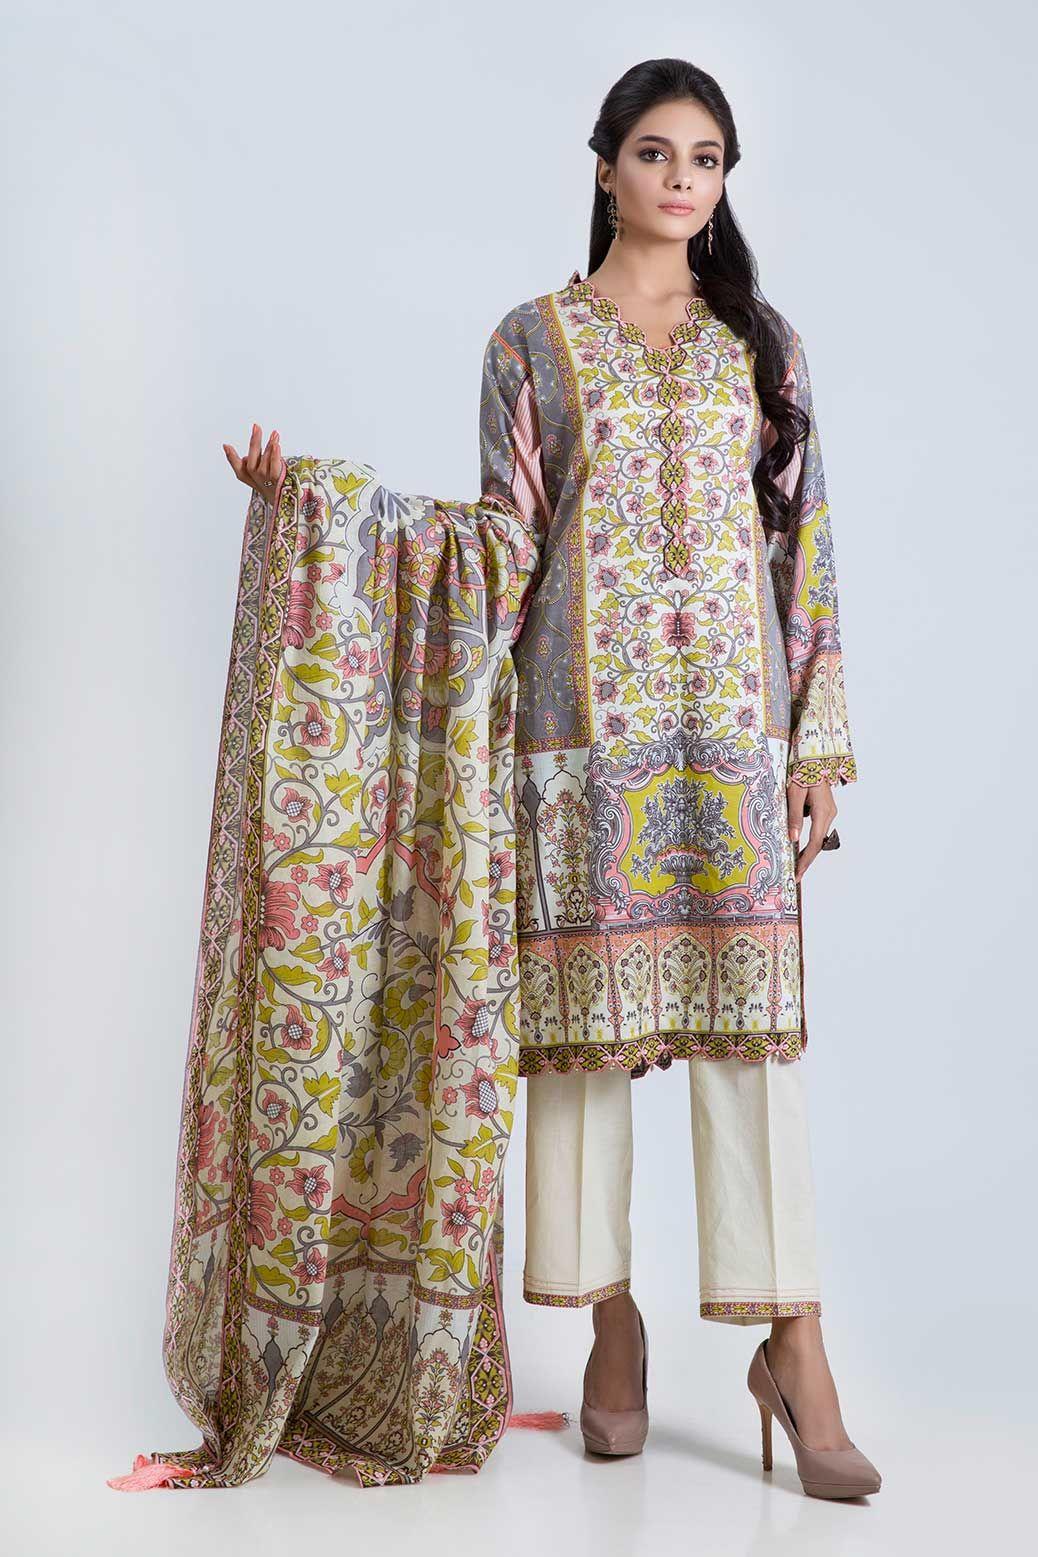 Latest Bonanza Satrangi Lawn Eid Collection